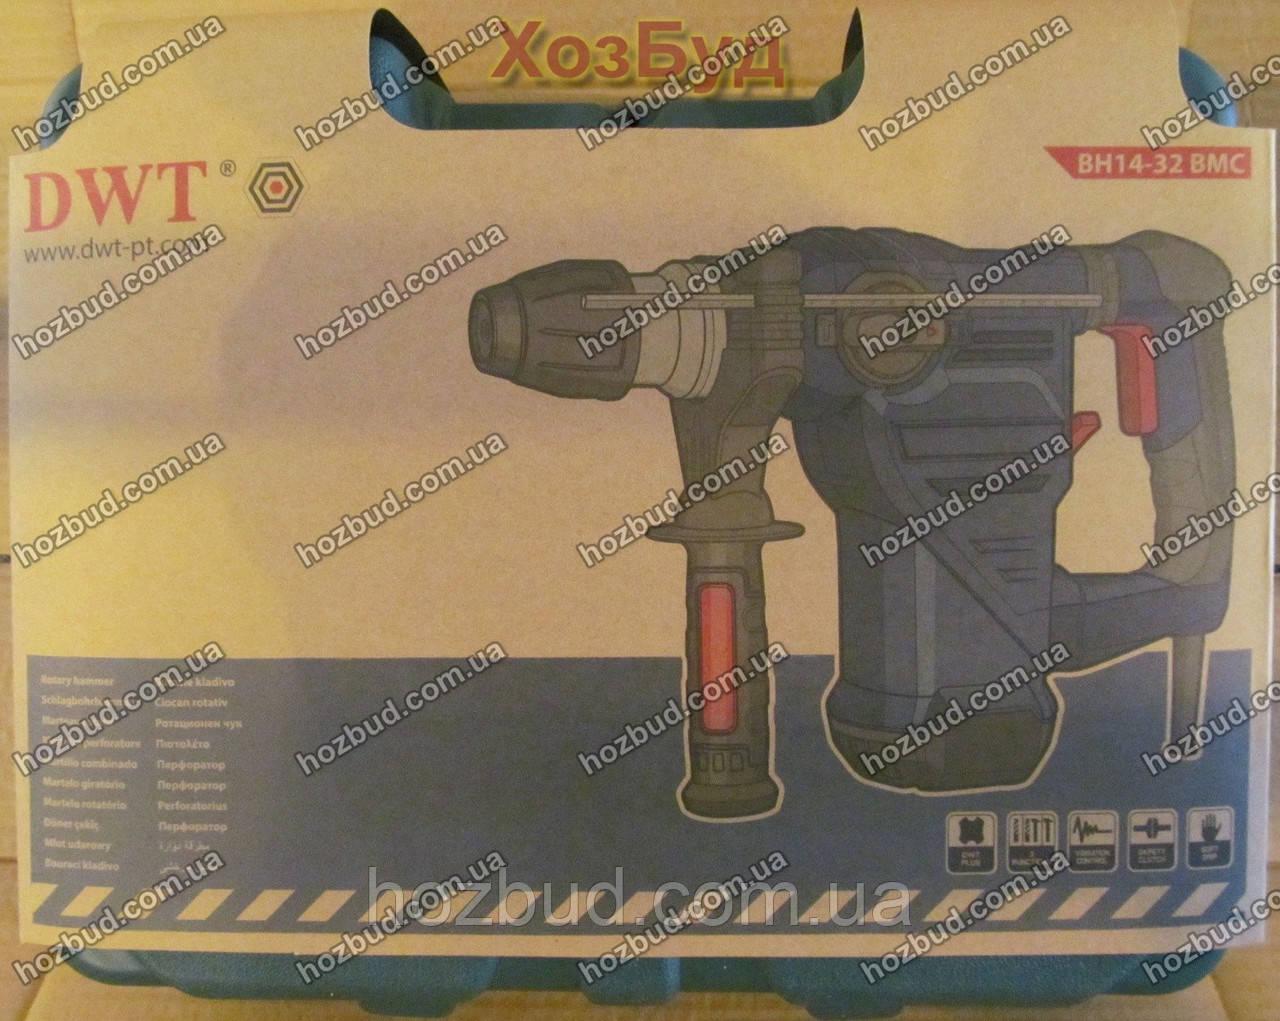 Перфоратор DWT BH 14-32 BMC